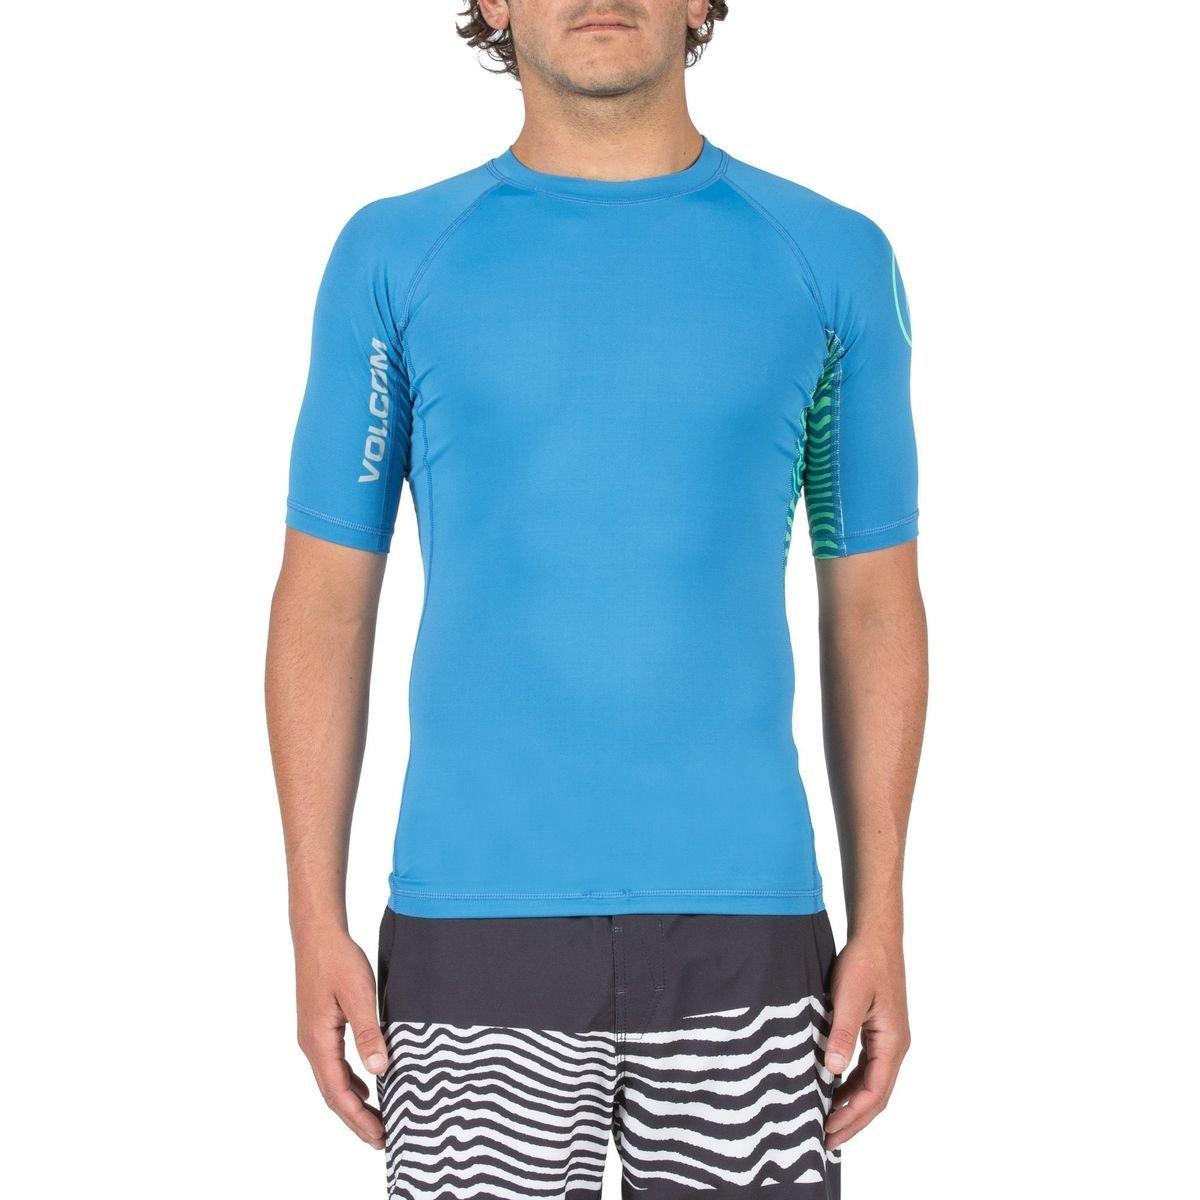 Volcom Young Men's Volcom Men's Vibes Short Sleeve Rashguard Shirt Volcom Young Men's N0111701